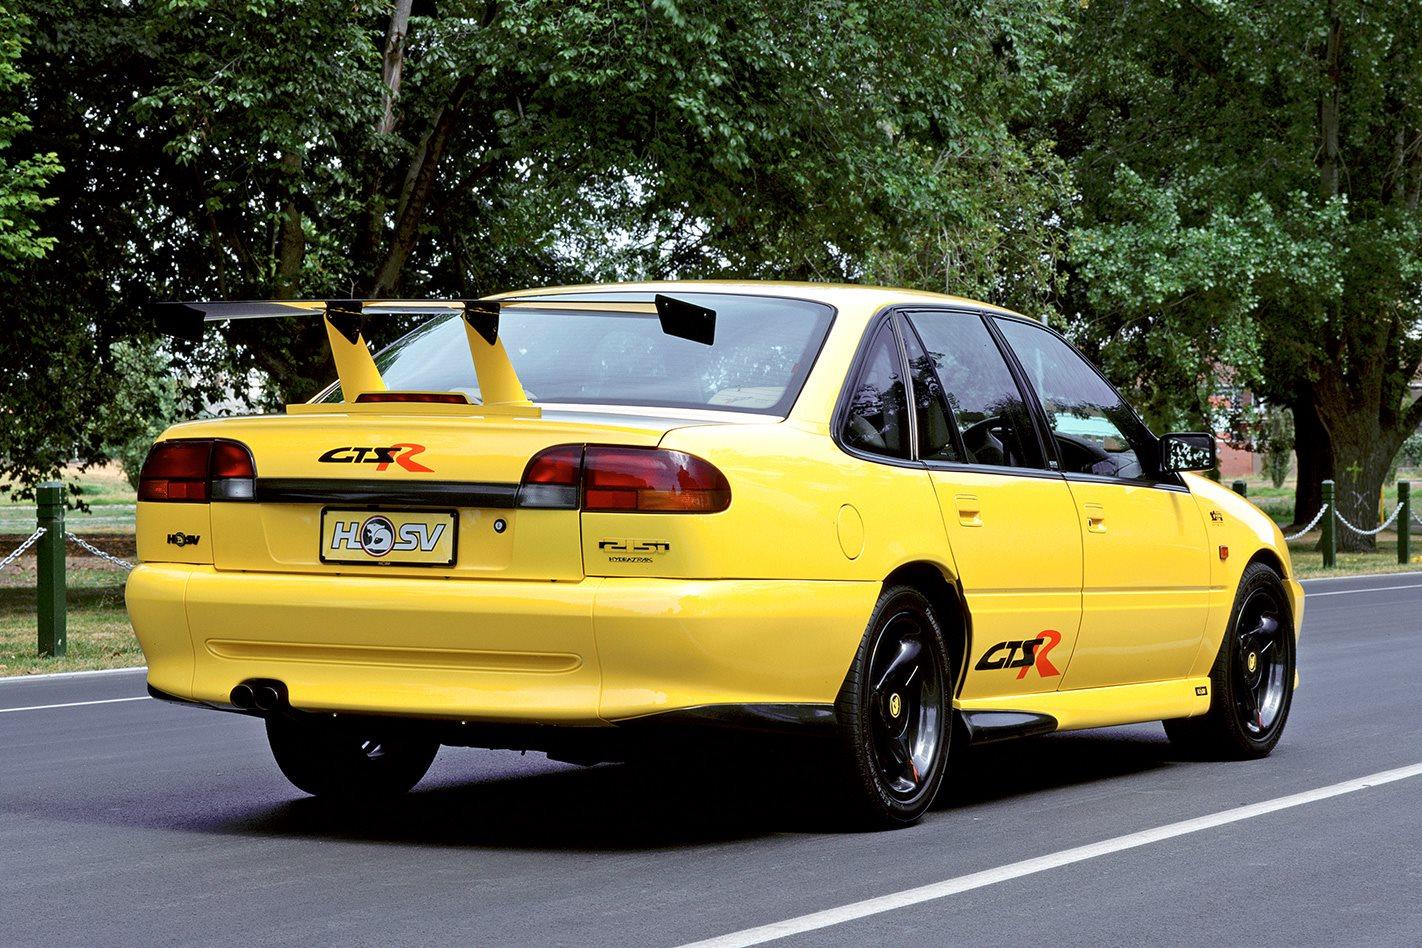 Hsv Gts R On Sale Main on 1996 Ford Ranger 3 0 Motor